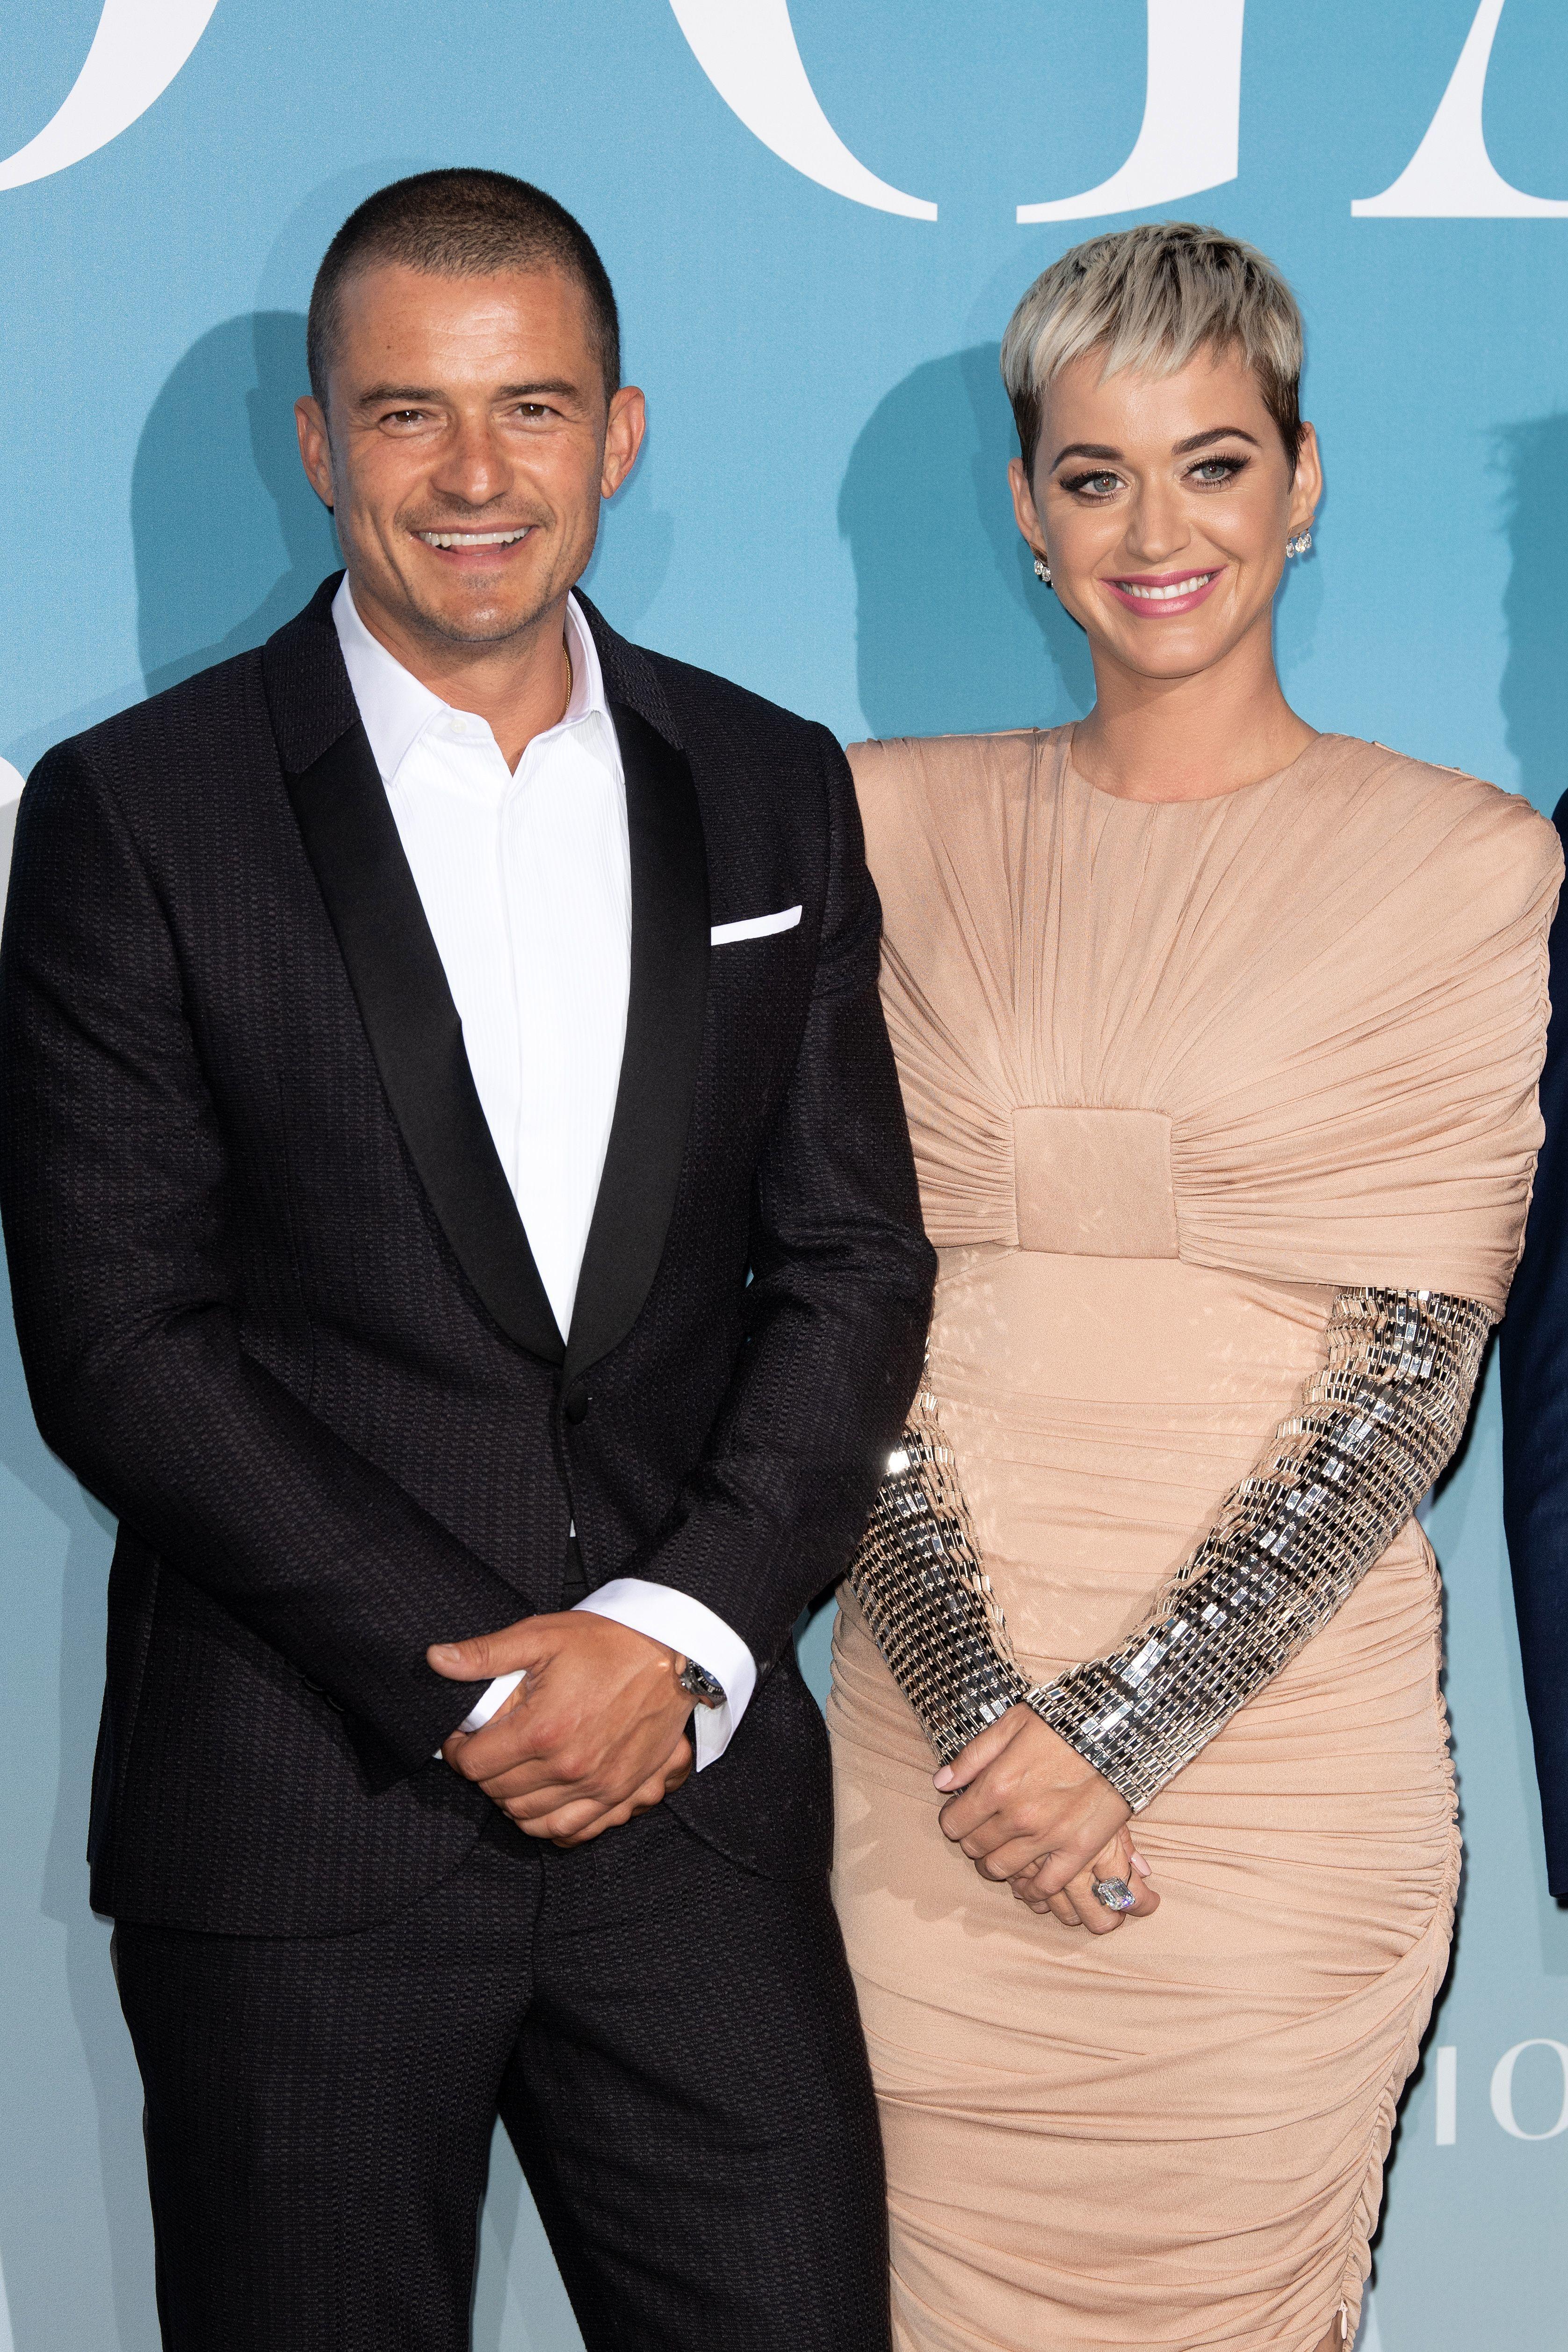 Katy Perry and Orlando Bloom relationship timeline | Gallery | Wonderwall.com